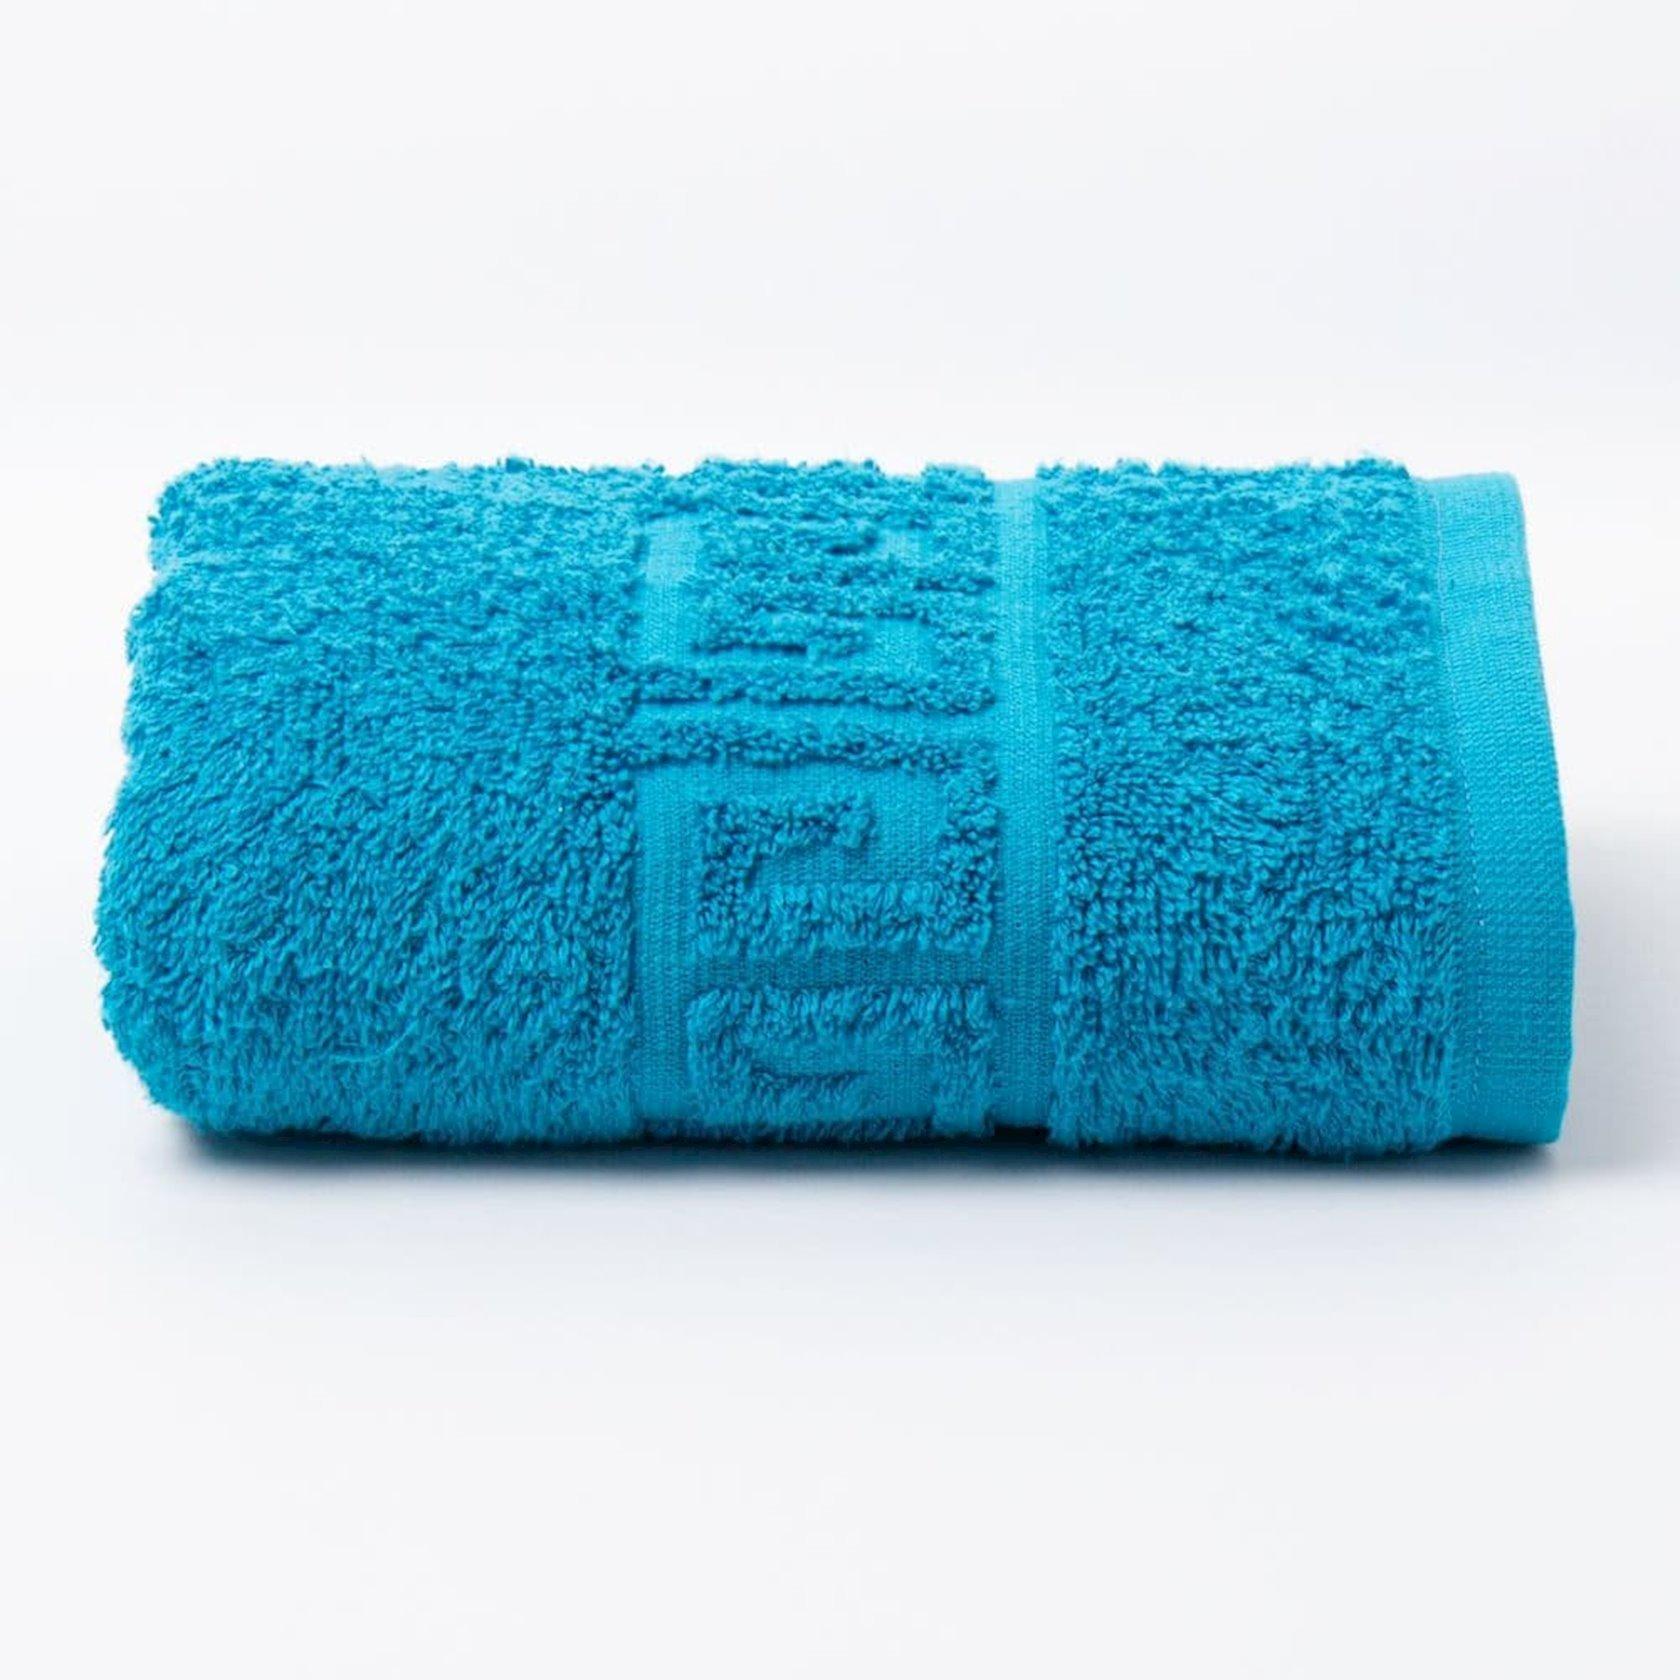 Hamam dəsmalı ADT Algiers blue 70x140, sıxlıq 430 qr/m²